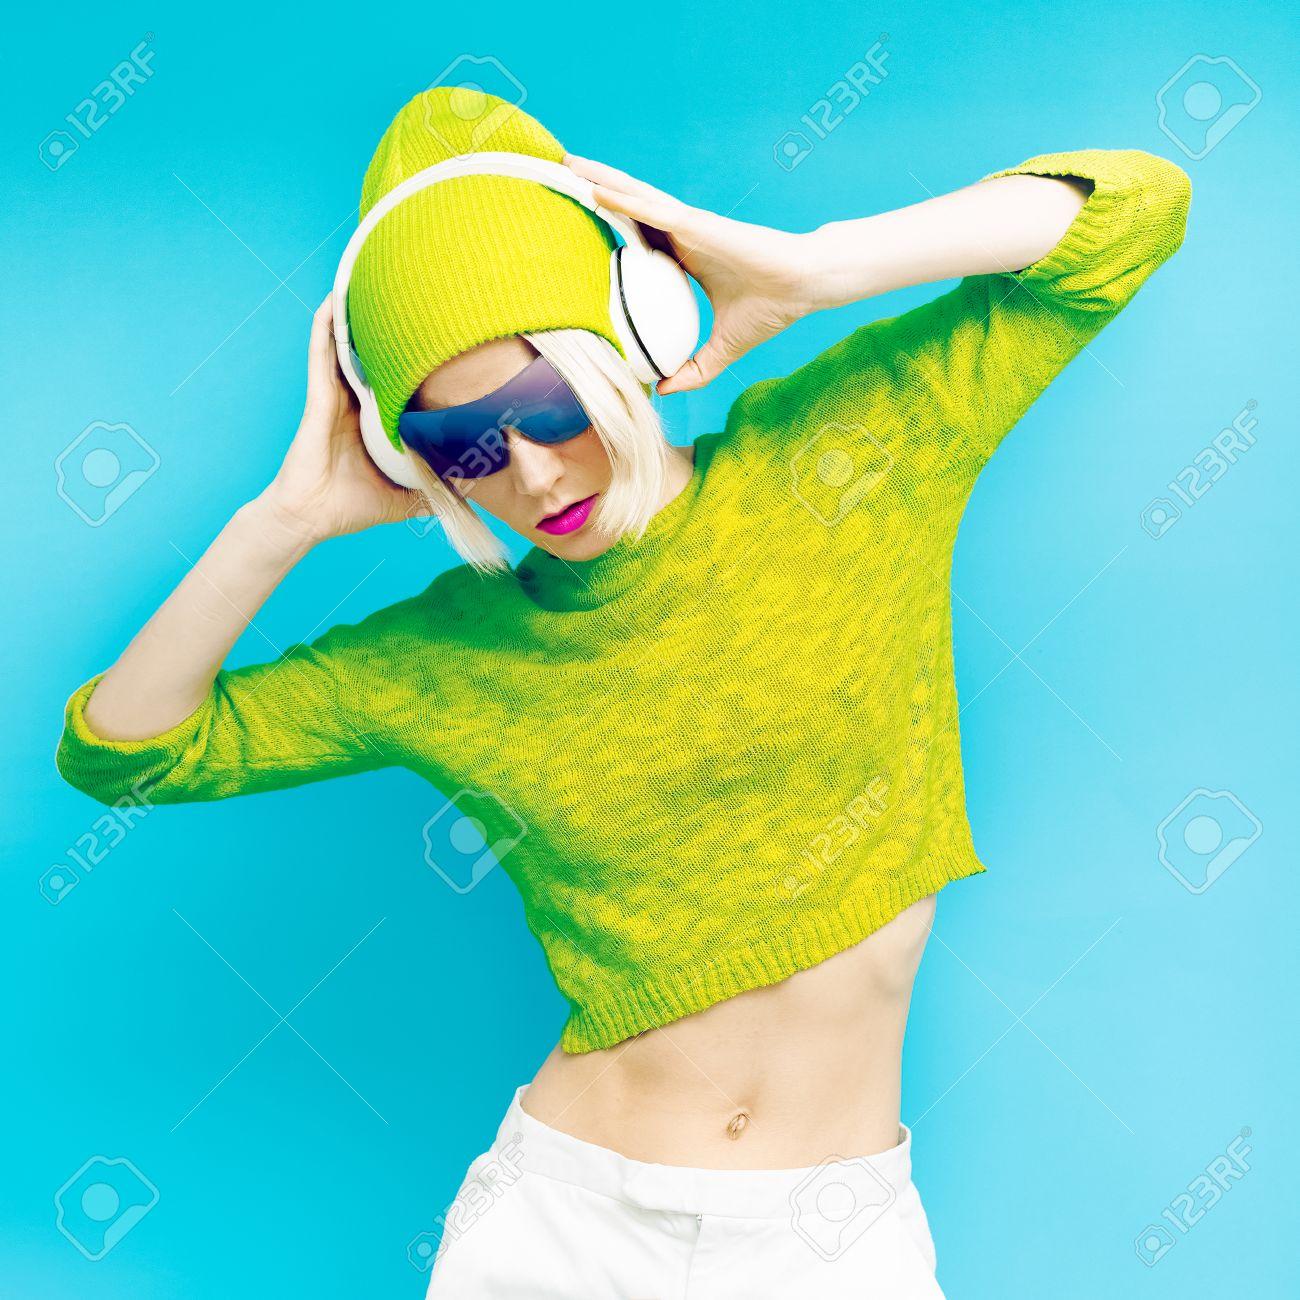 Glamorous Lada DJ in fashionable sportswear listening to Musik on blue background - 36050086